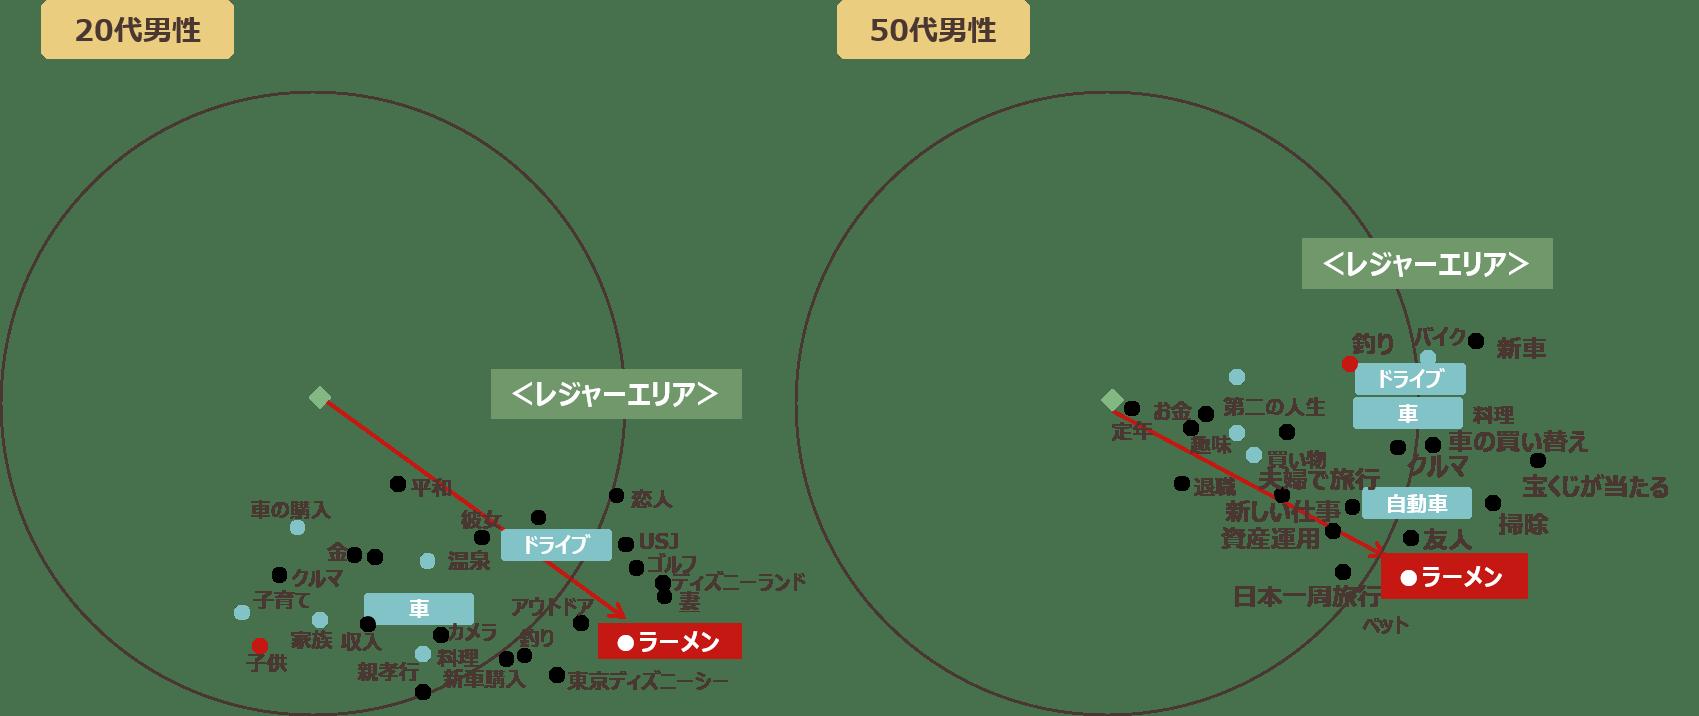 2020seikatsusha5_04.png